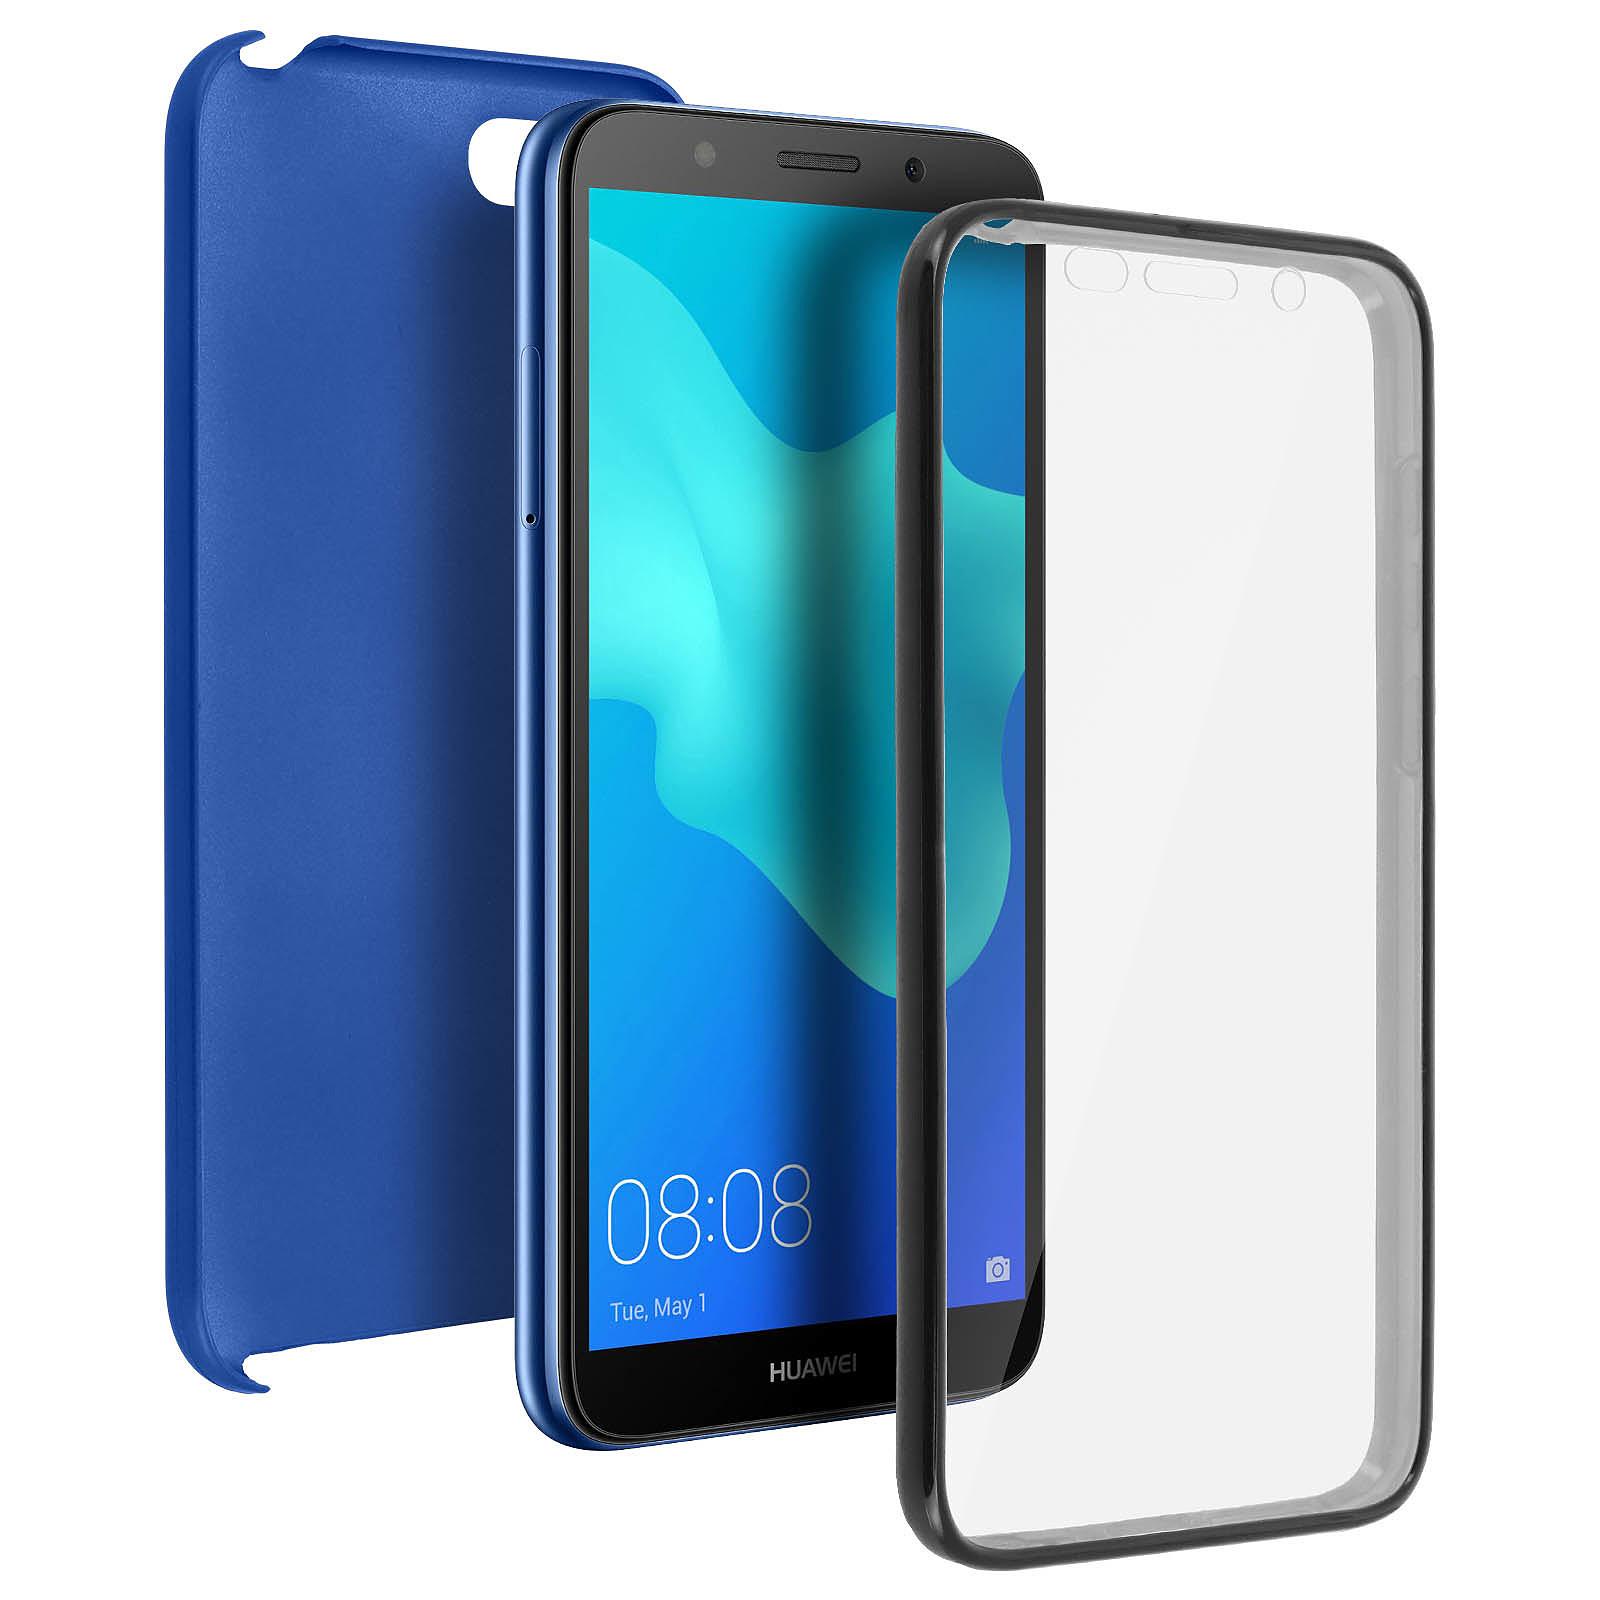 Avizar Coque Bleu pour Huawei Y5 2018 , Honor 7S